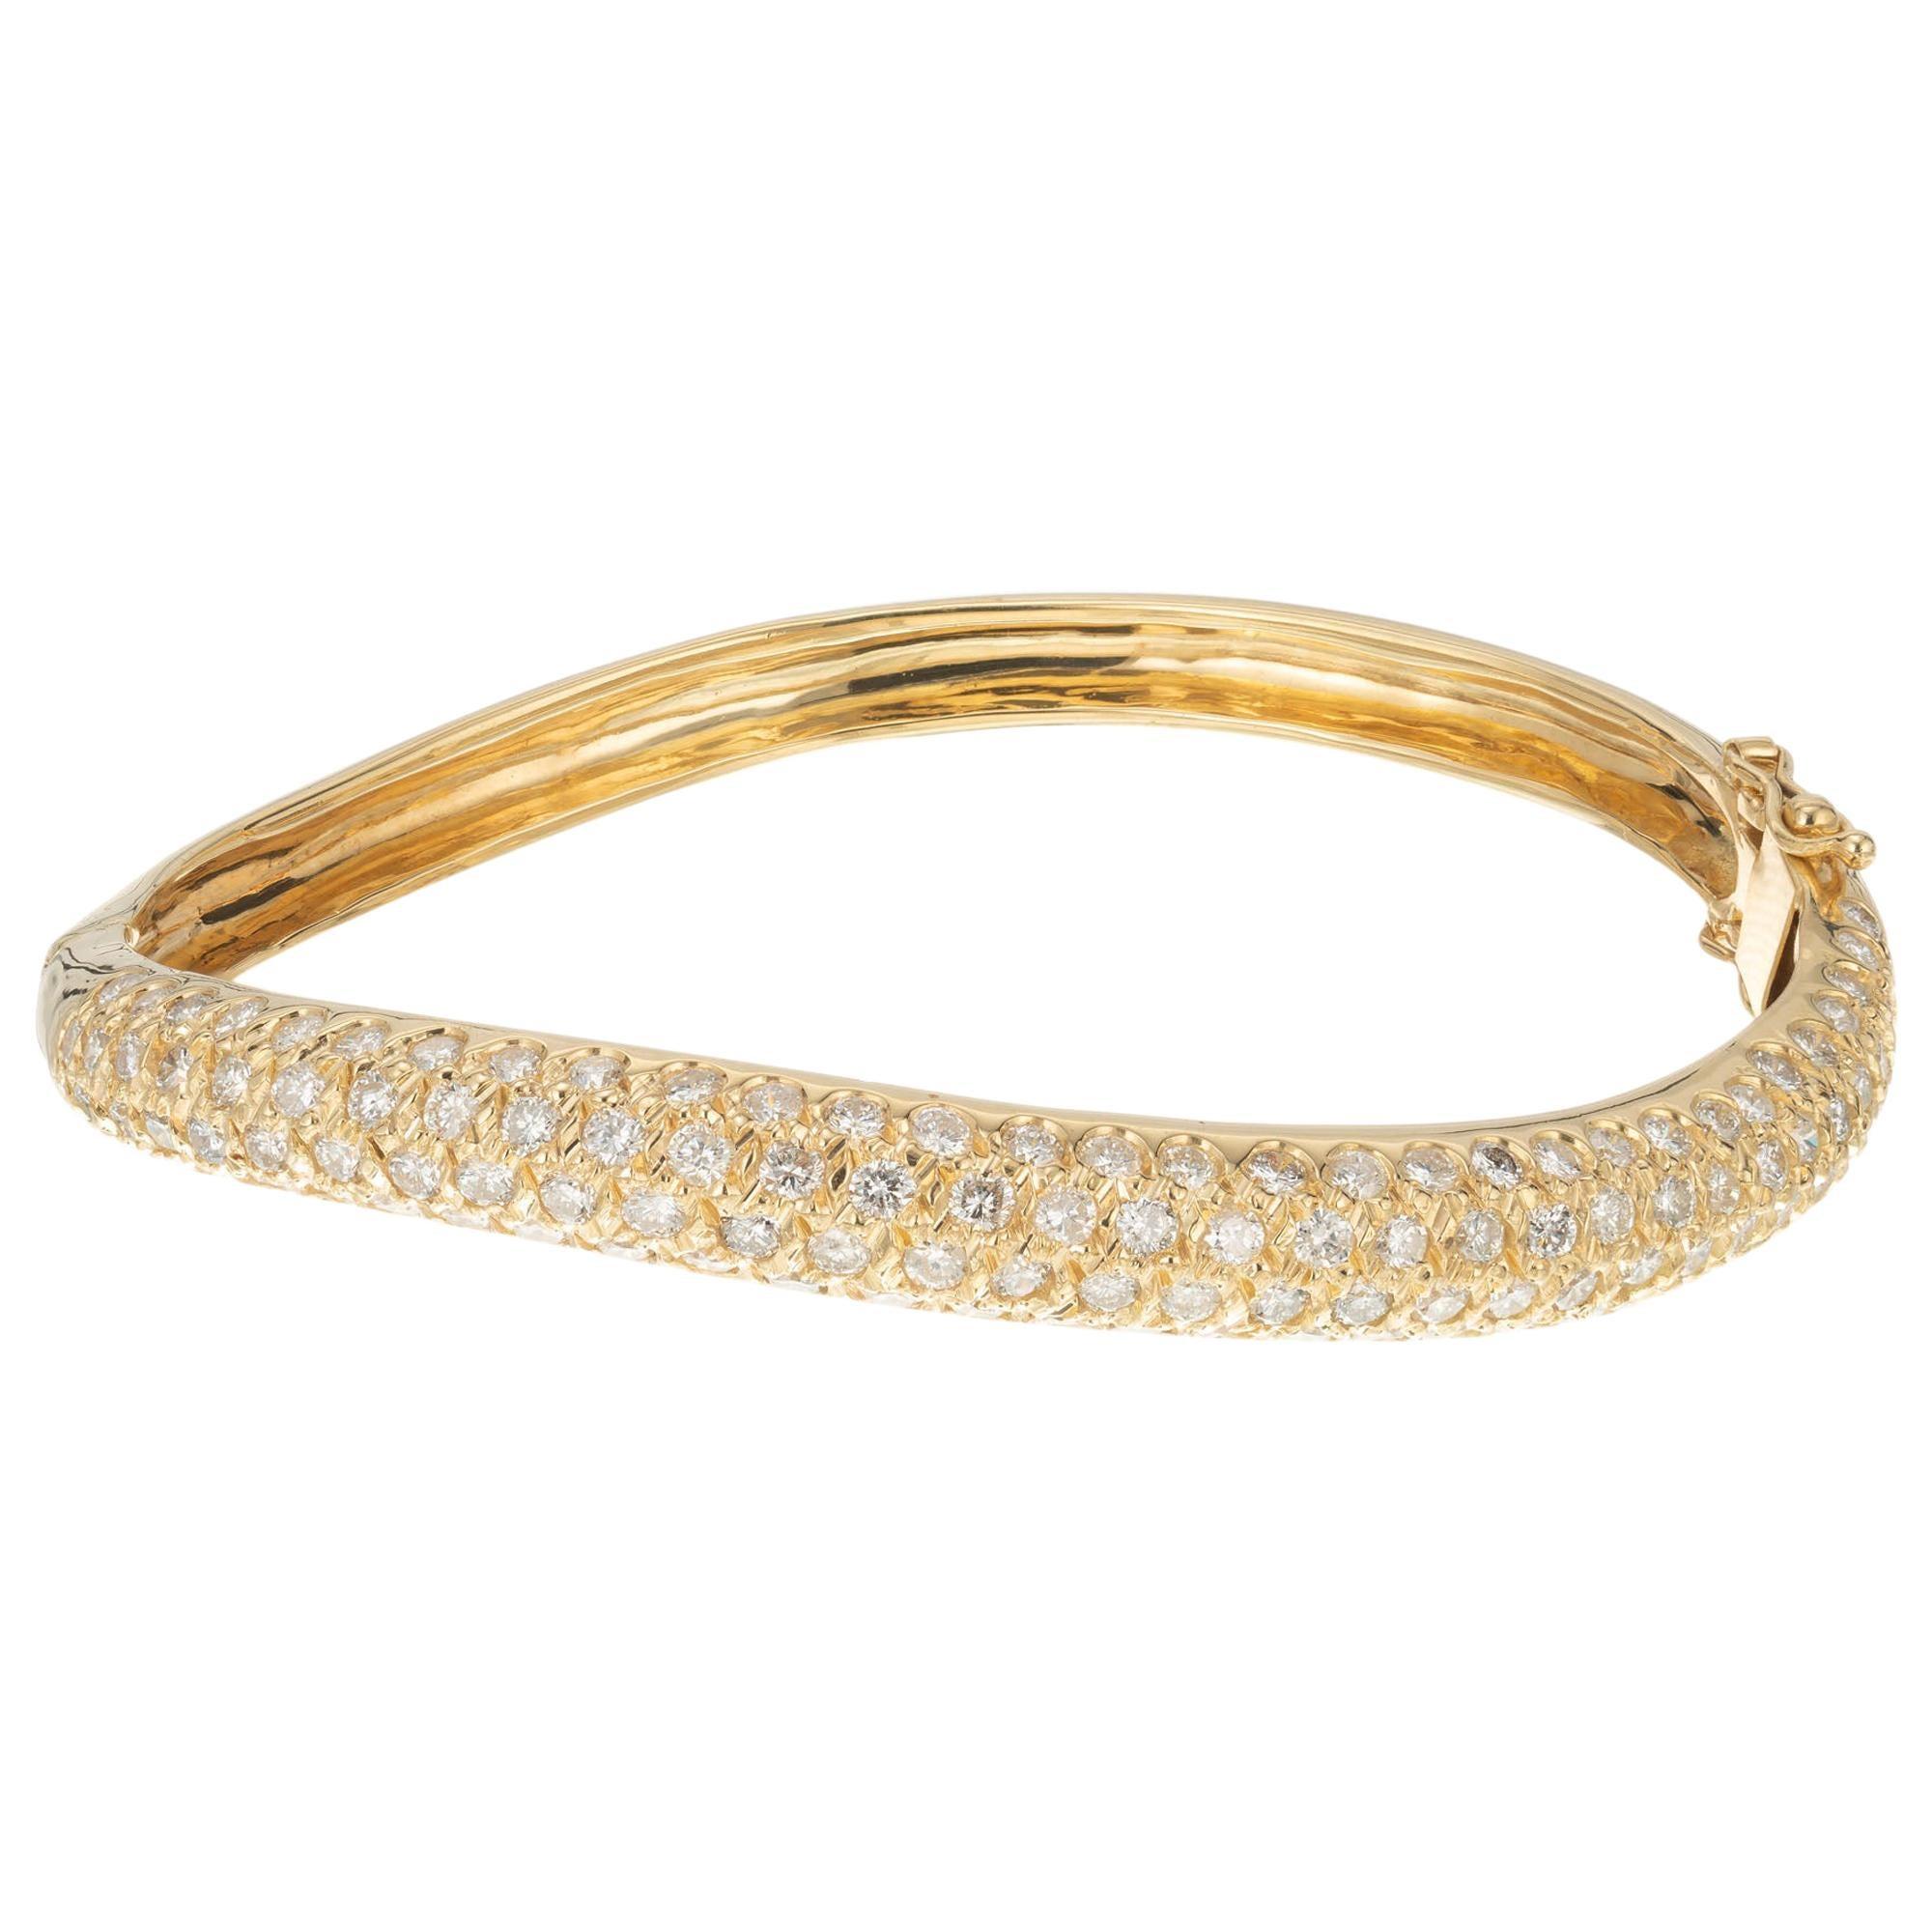 2.00 Carat Diamond Yellow Gold Swirl Bangle Bracelet